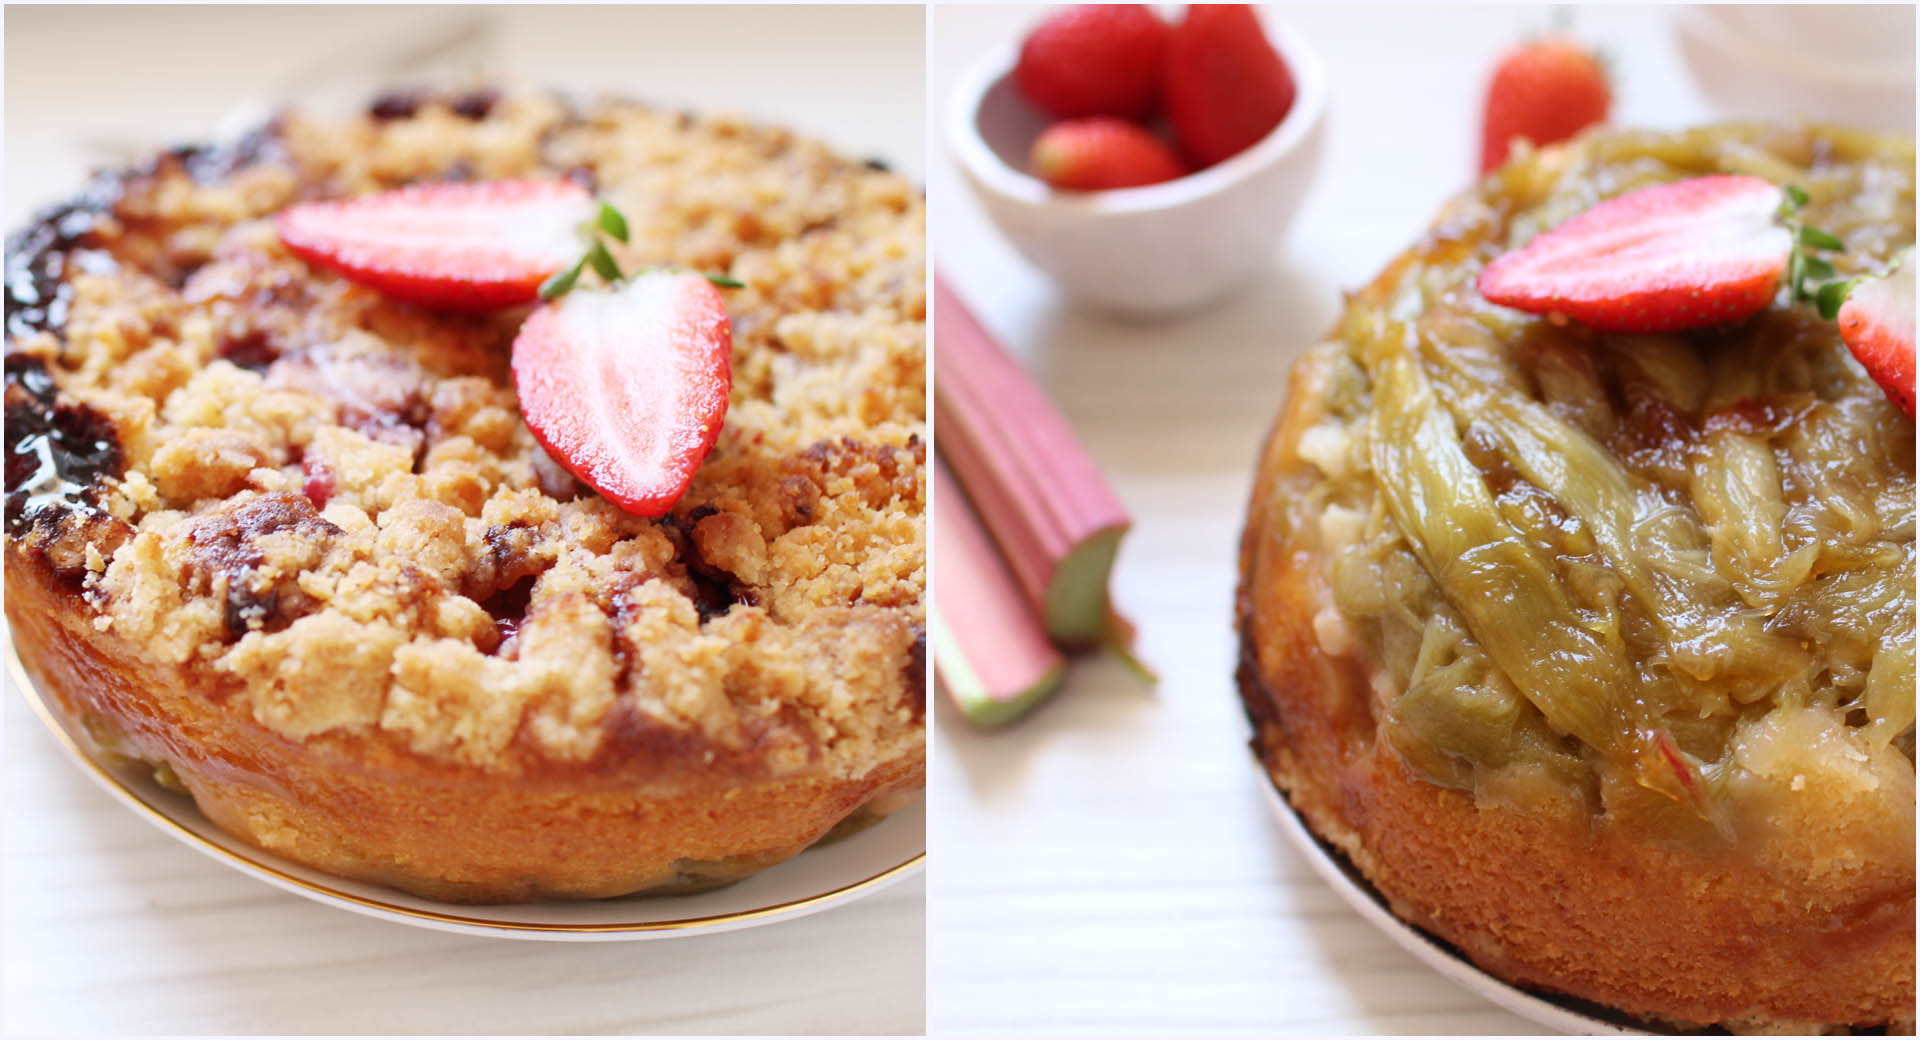 gateau reversible renverse rhunarbe crumble fraises martha stewart